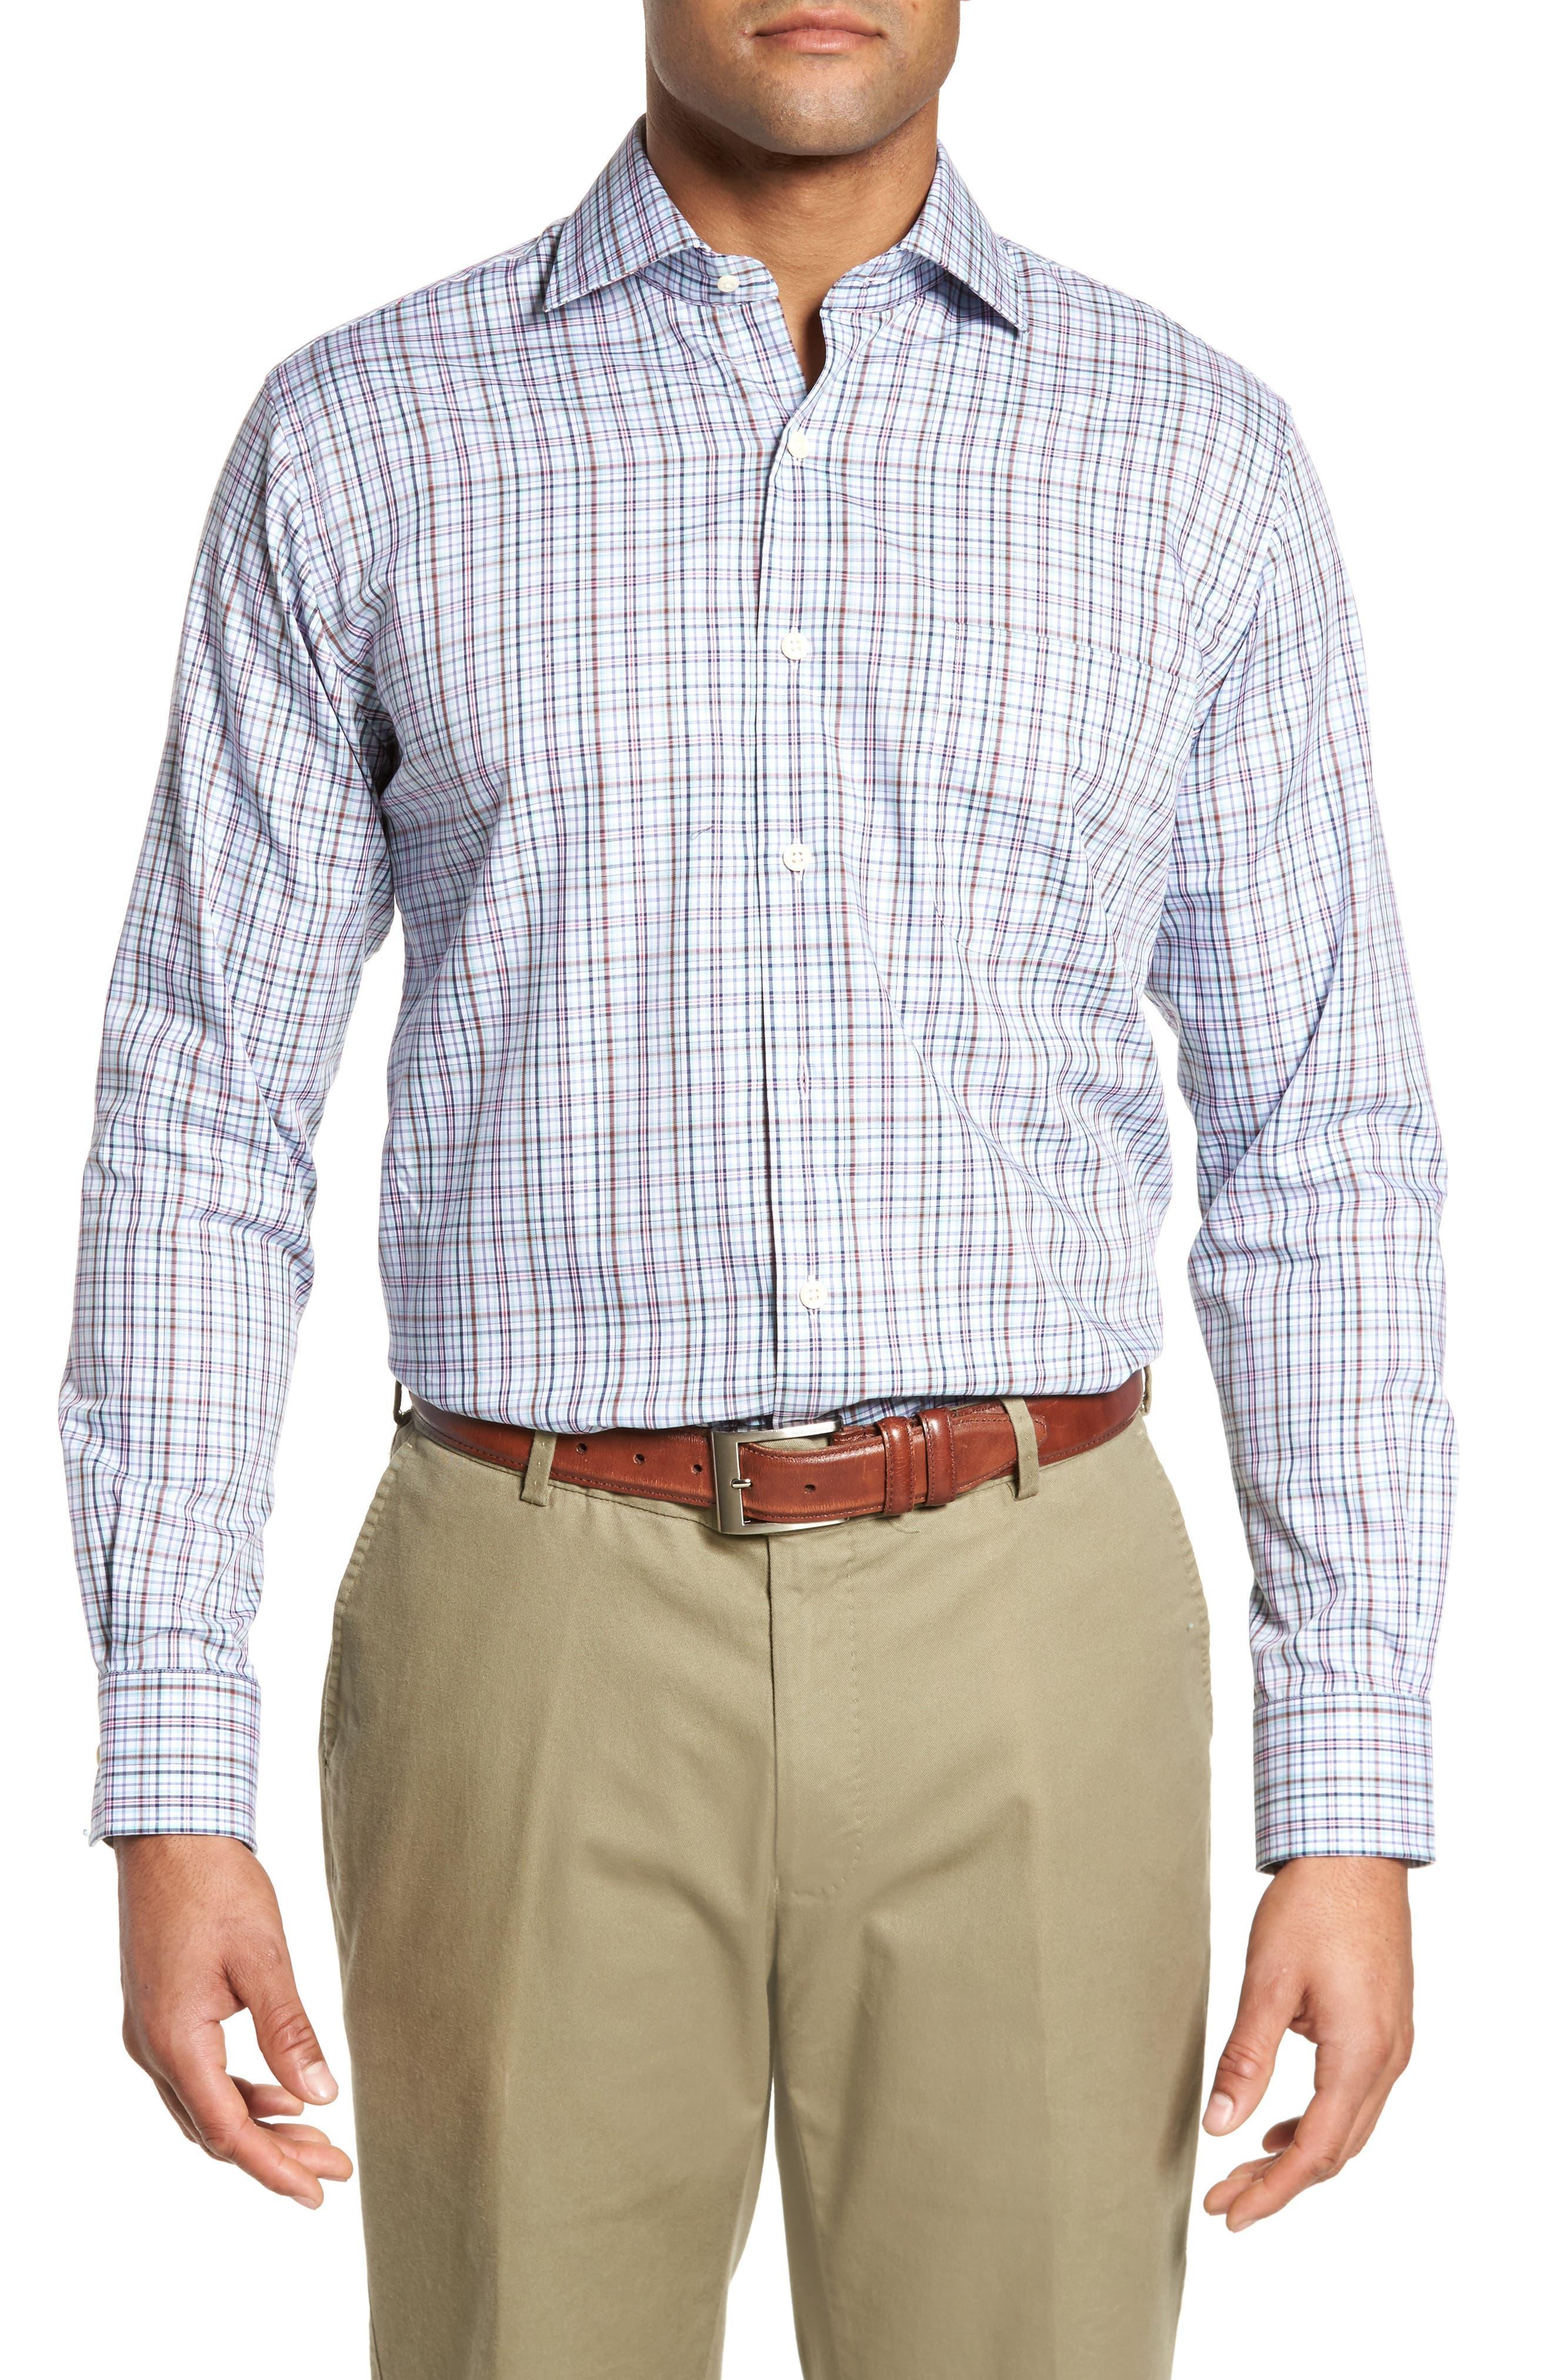 Crown Ease Tango Pinwheel Regular Fit Sport Shirt,                             Main thumbnail 1, color,                             Tar Heel Blue